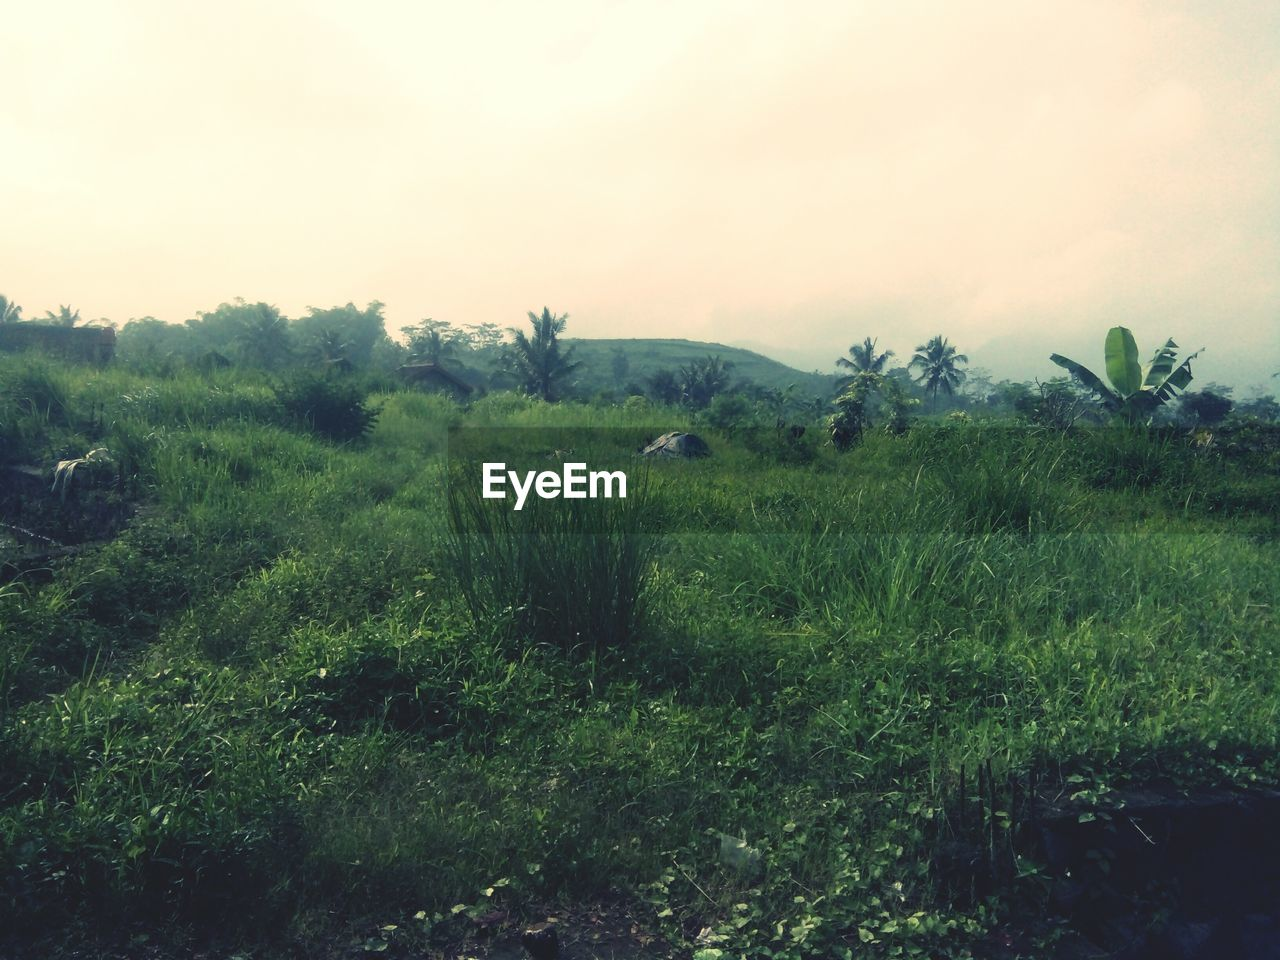 plant, land, field, sky, grass, environment, landscape, tree, nature, green color, tranquil scene, no people, tranquility, scenics - nature, beauty in nature, growth, mammal, animal, animal themes, non-urban scene